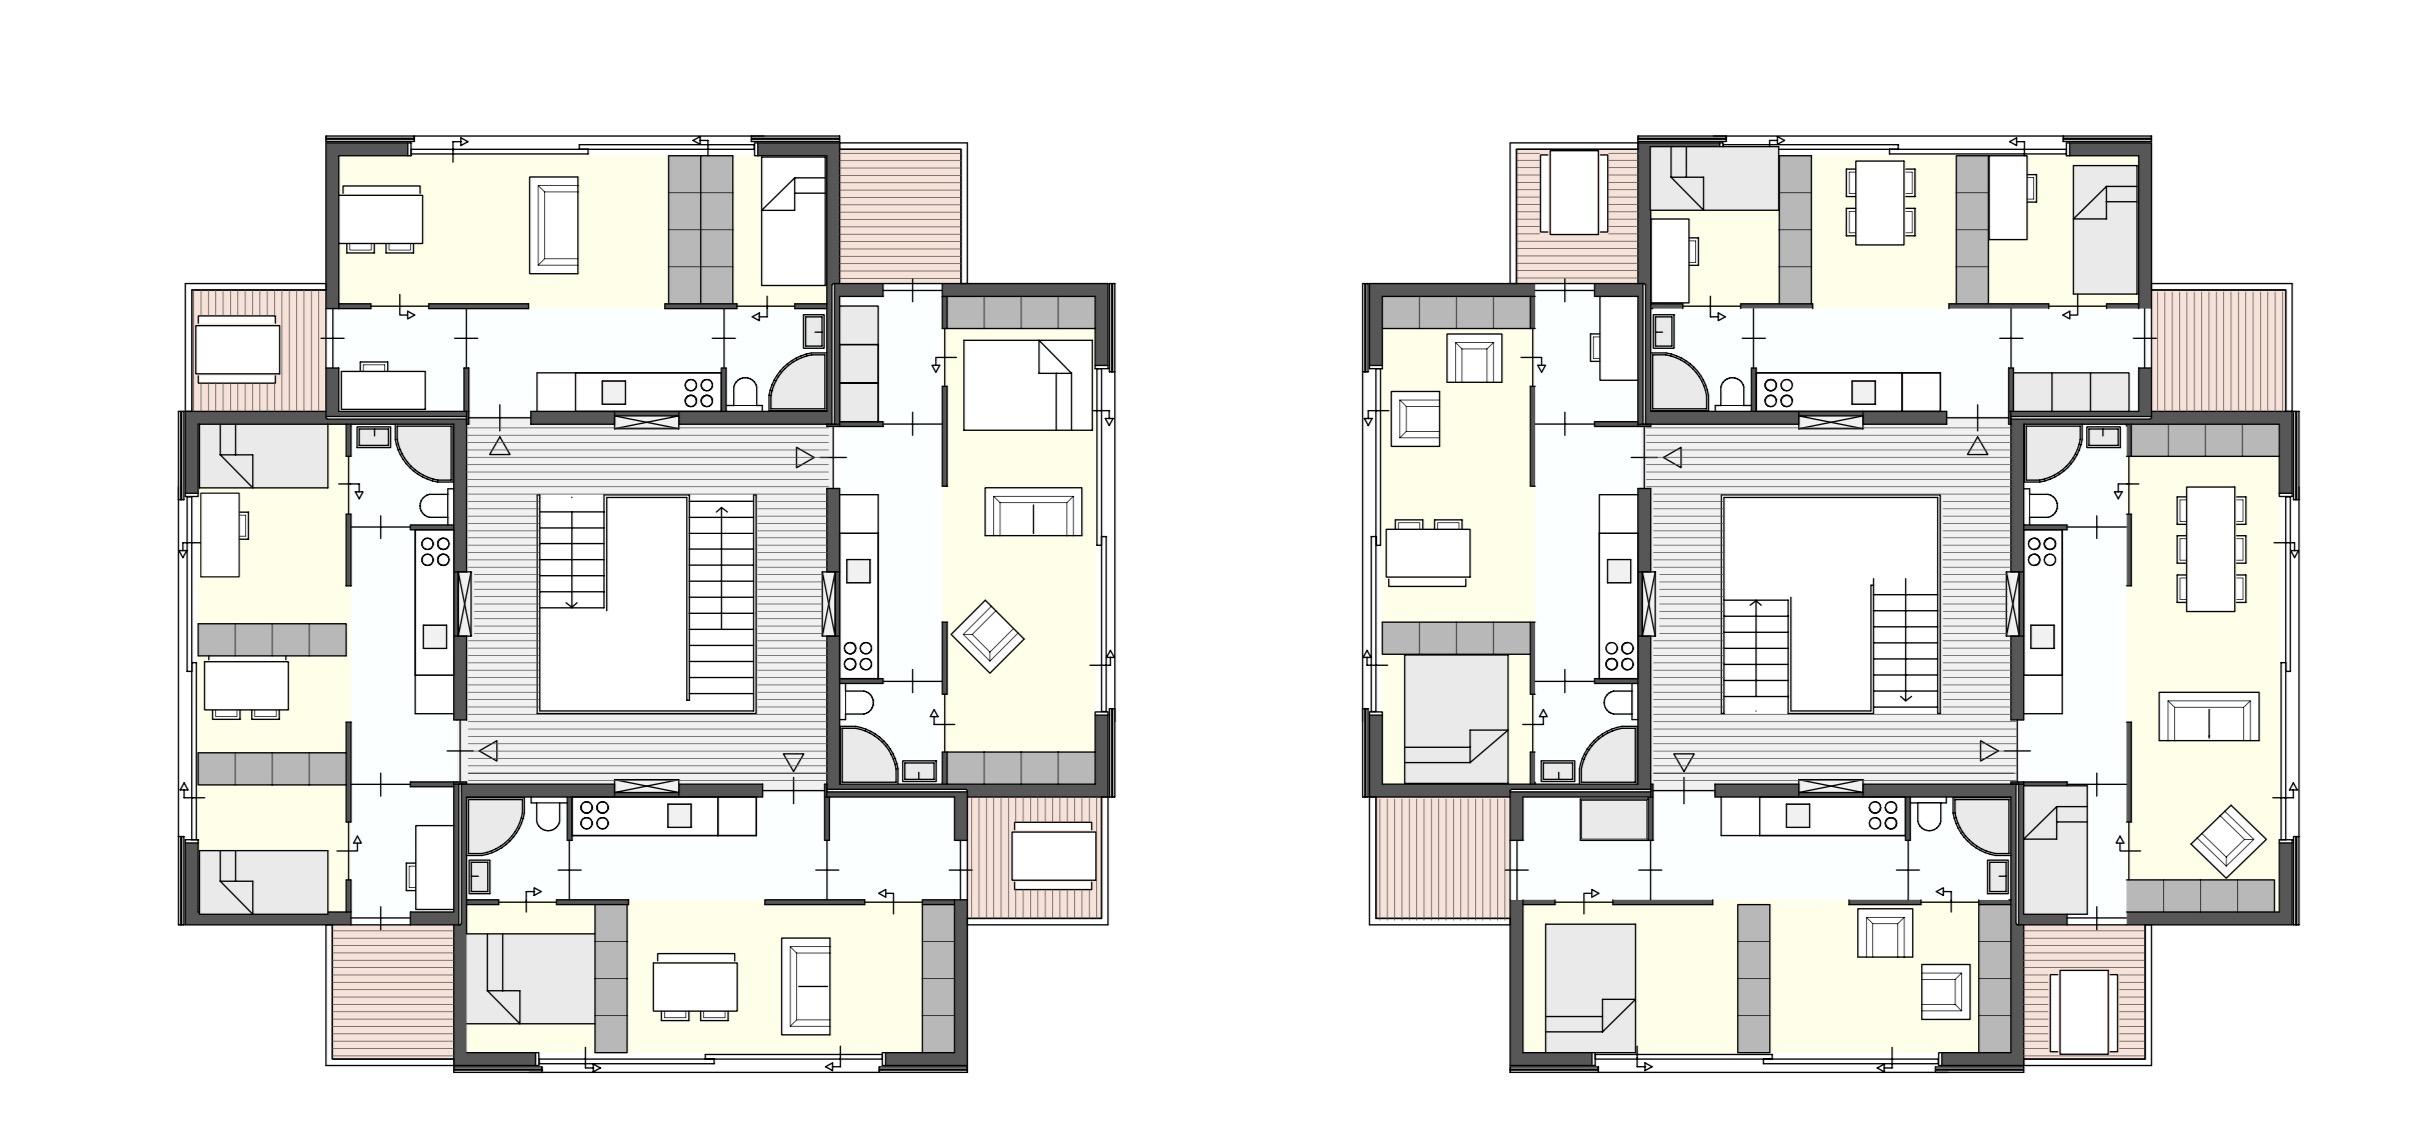 plattegrond stapelbare microappartementen